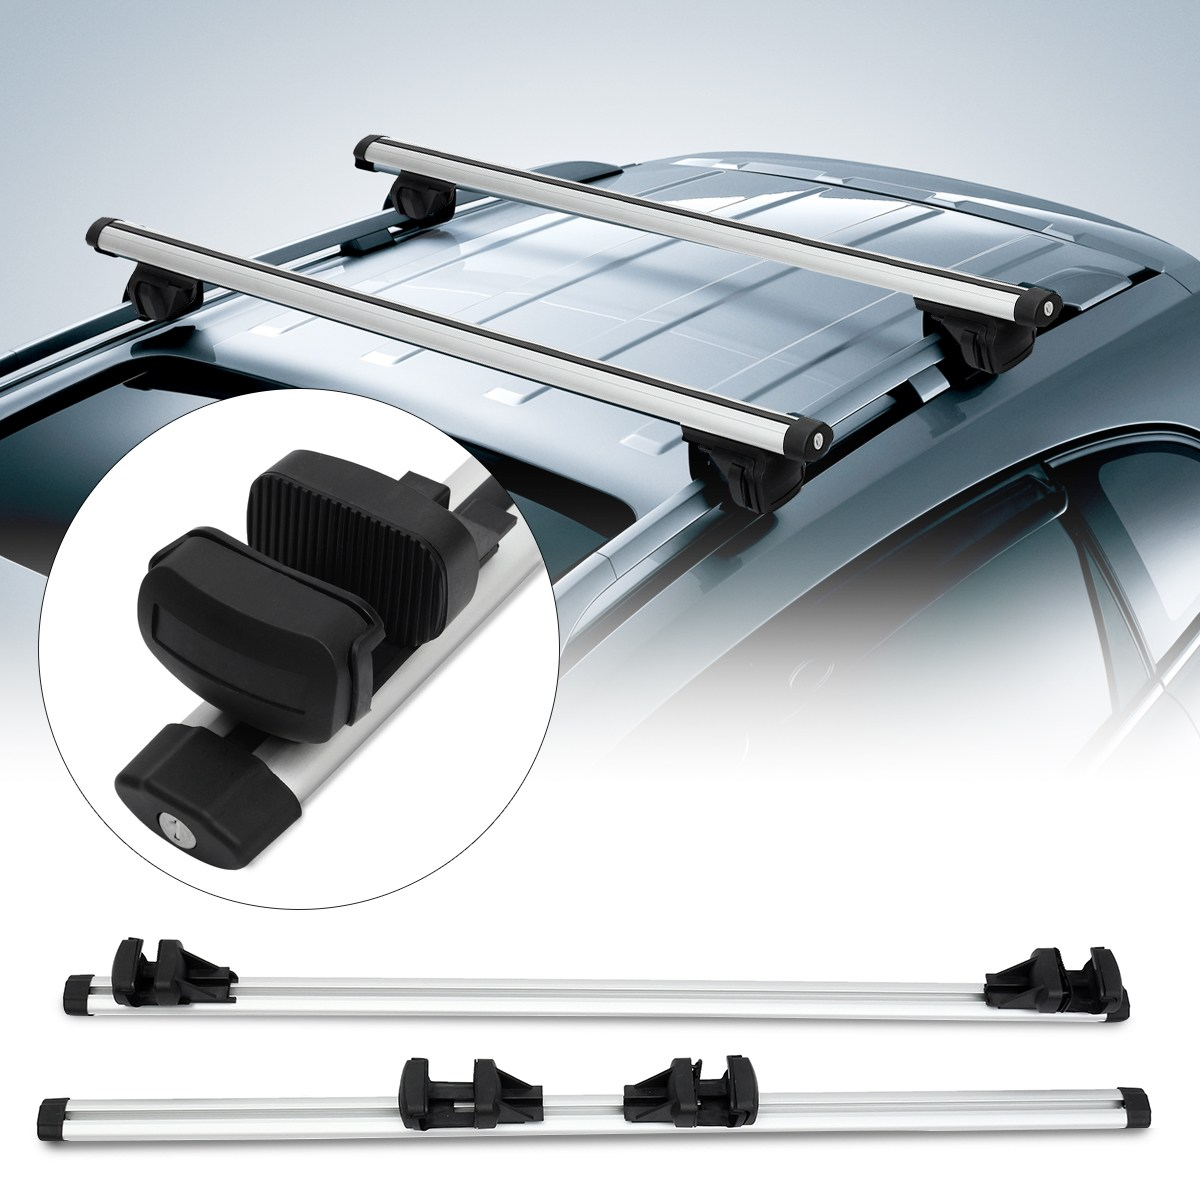 купить Car Silver Roof Rack Cross Bar with Anti-theft Lock Auto Roof Rails Rack Bars Outdoor Rooftop Luggage Carrier Racks 130cm по цене 2908.25 рублей